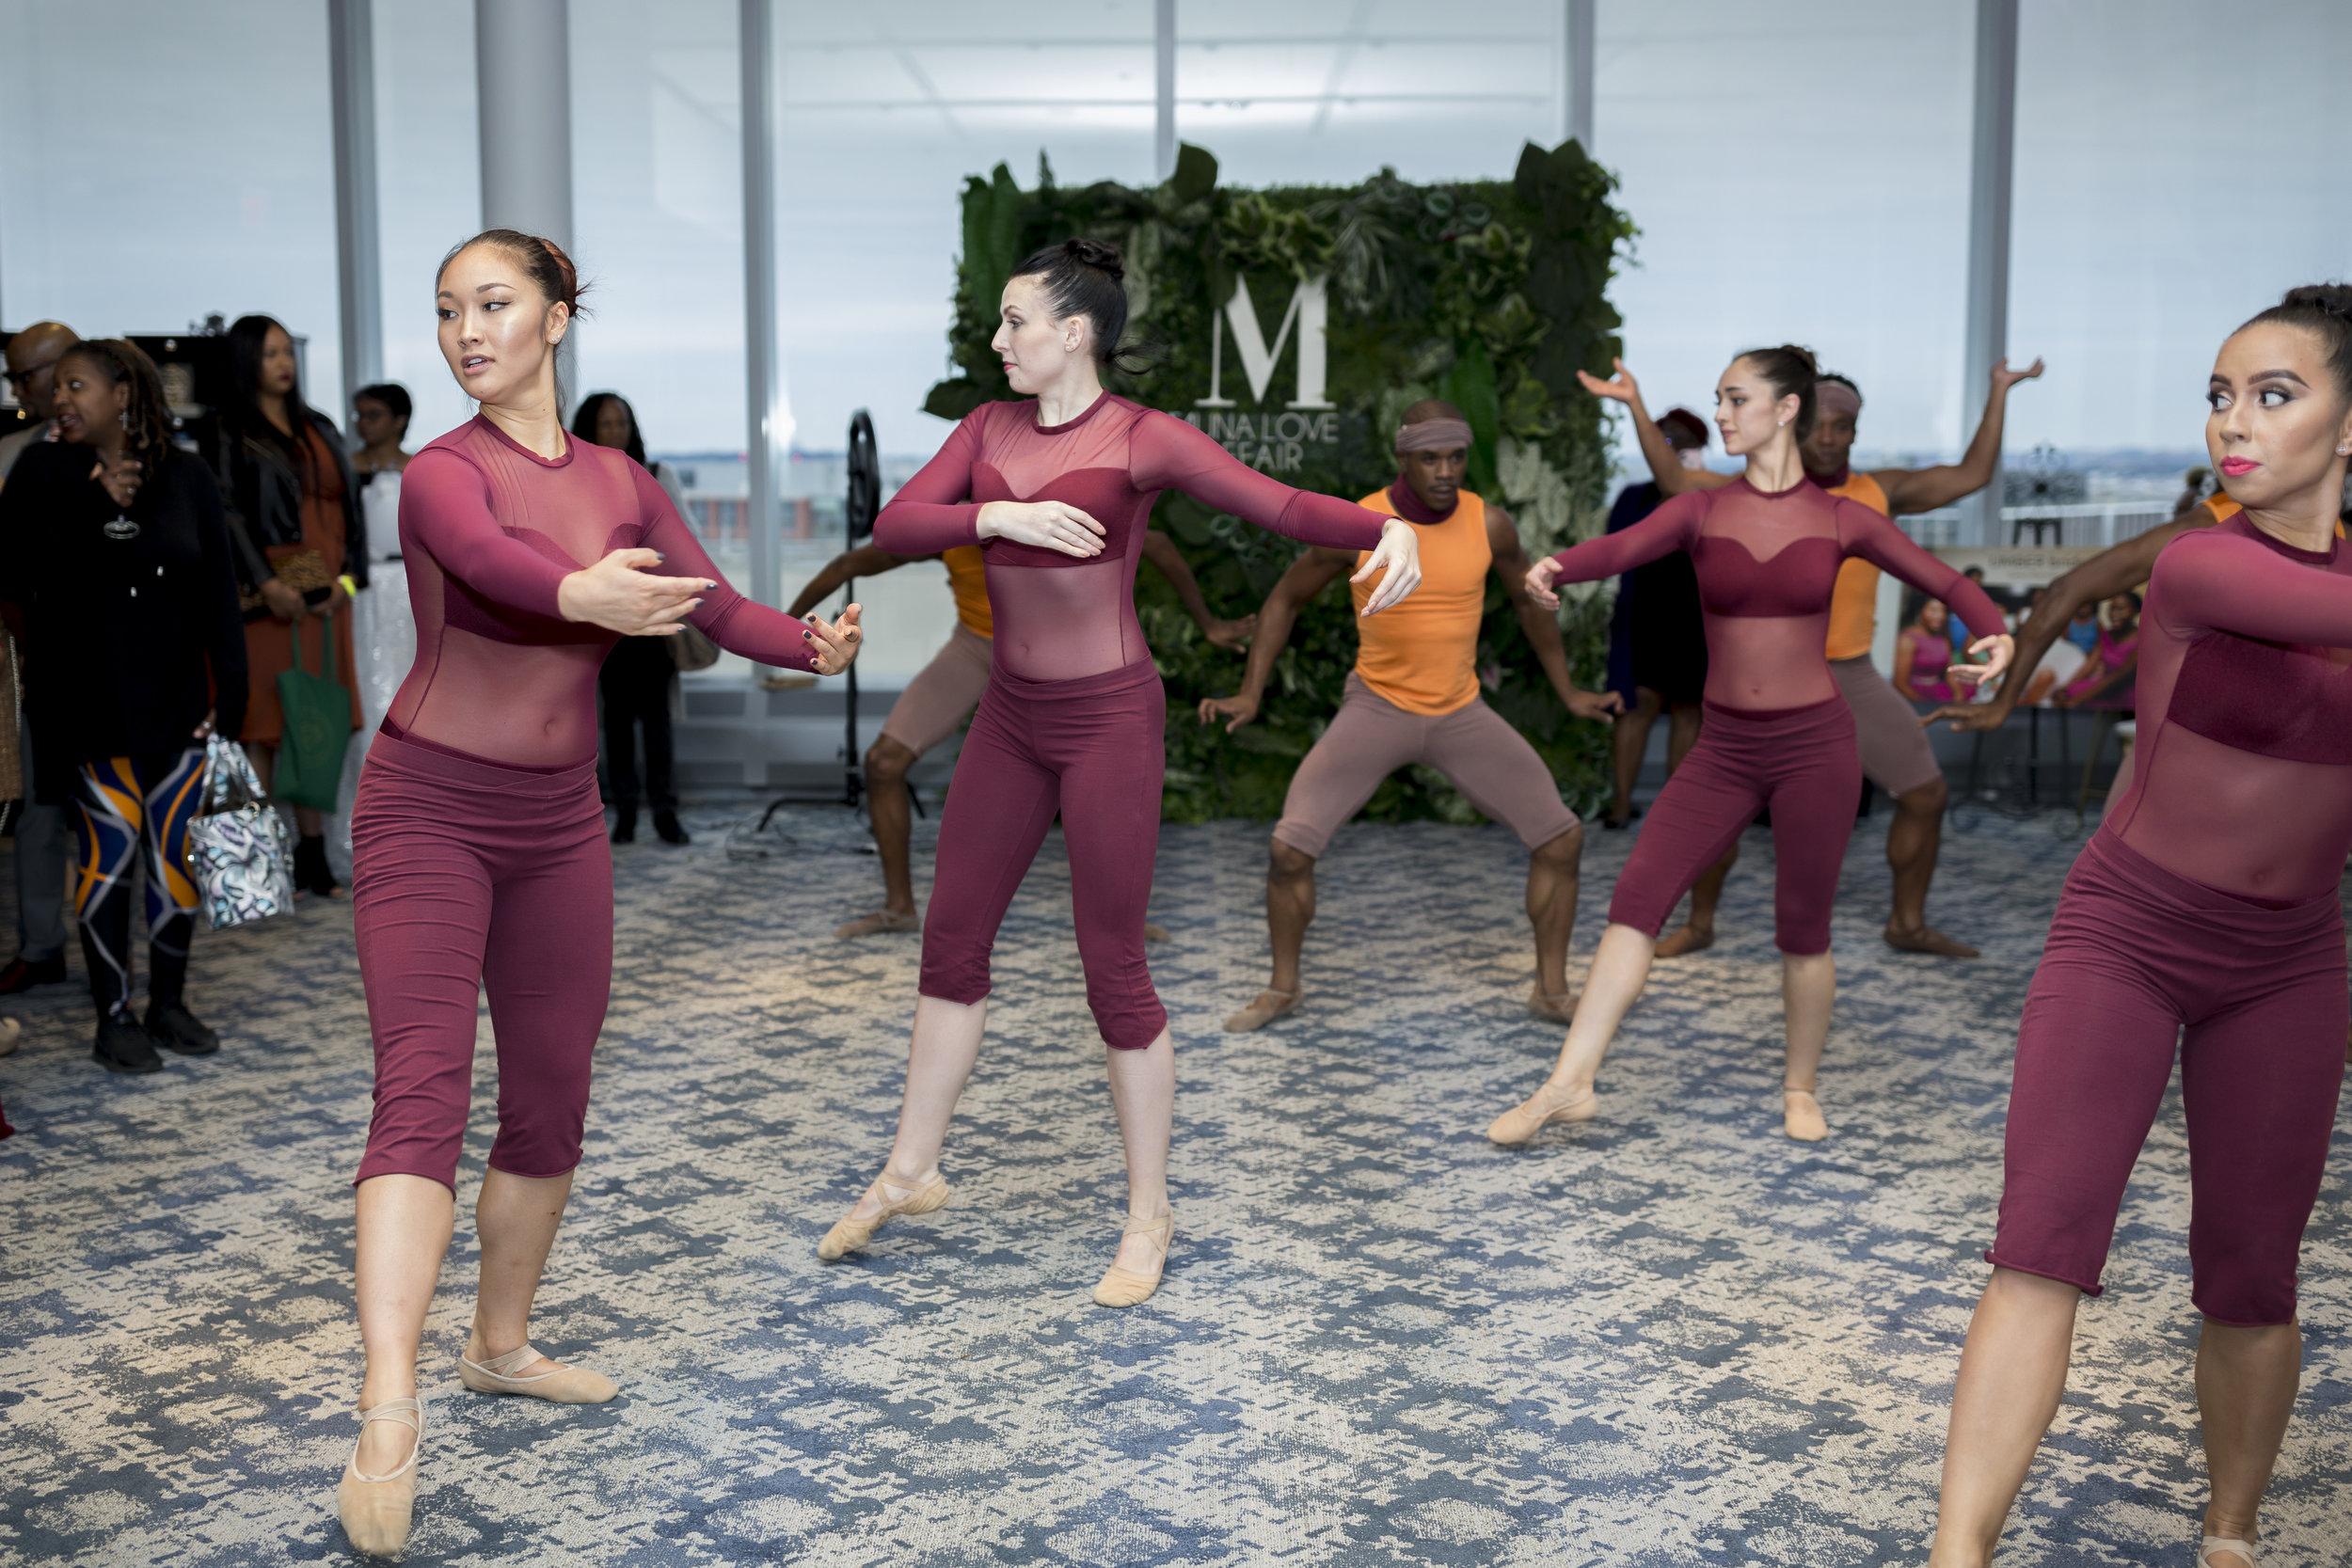 ngoma-dance-theatre-andrew-roby-events